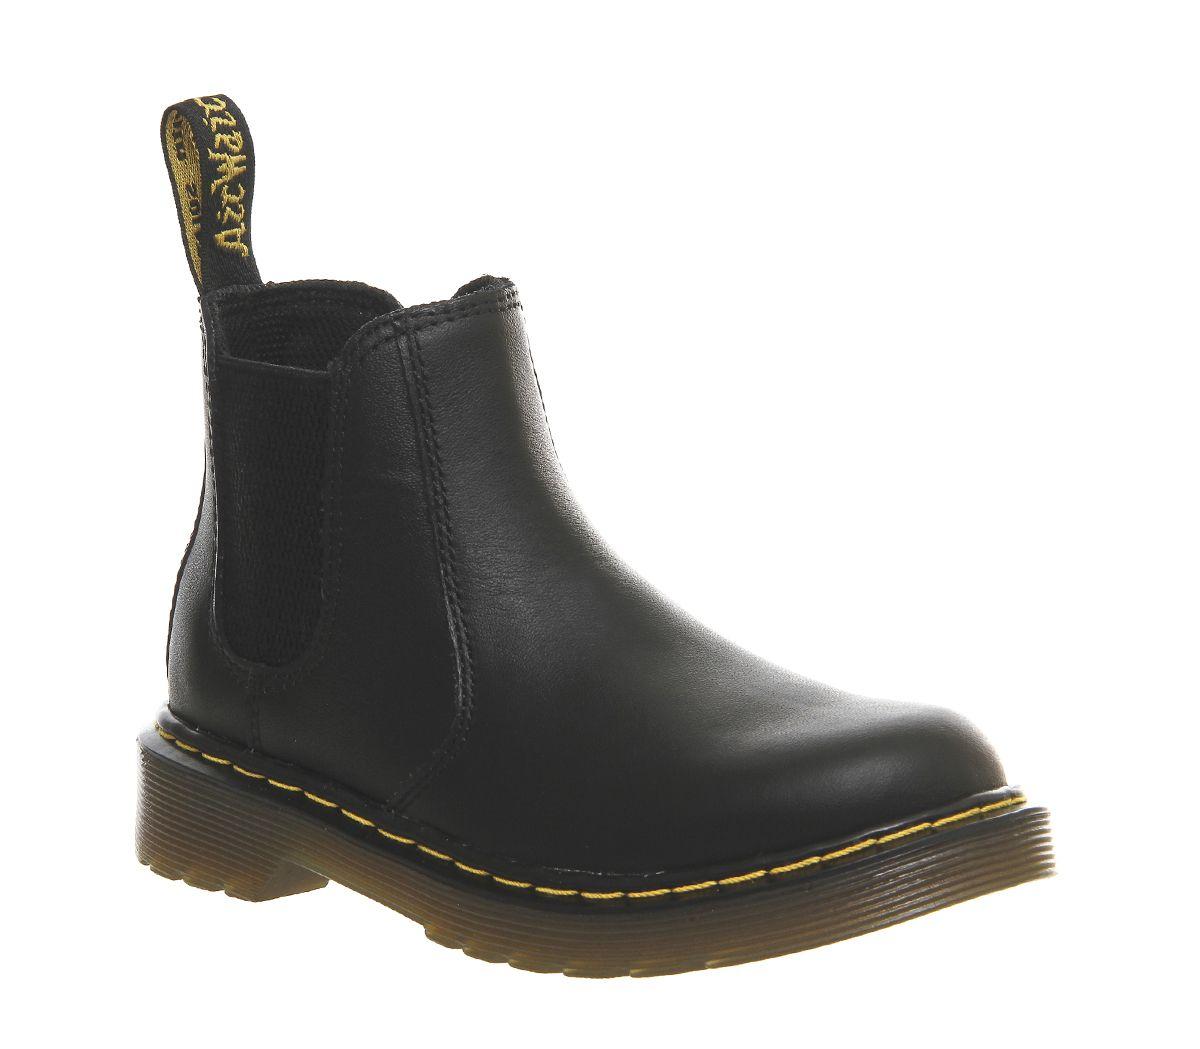 543ac2f22cc50 Dr. Martens Banzai Chelsea Boots (Junior) Black - Unisex